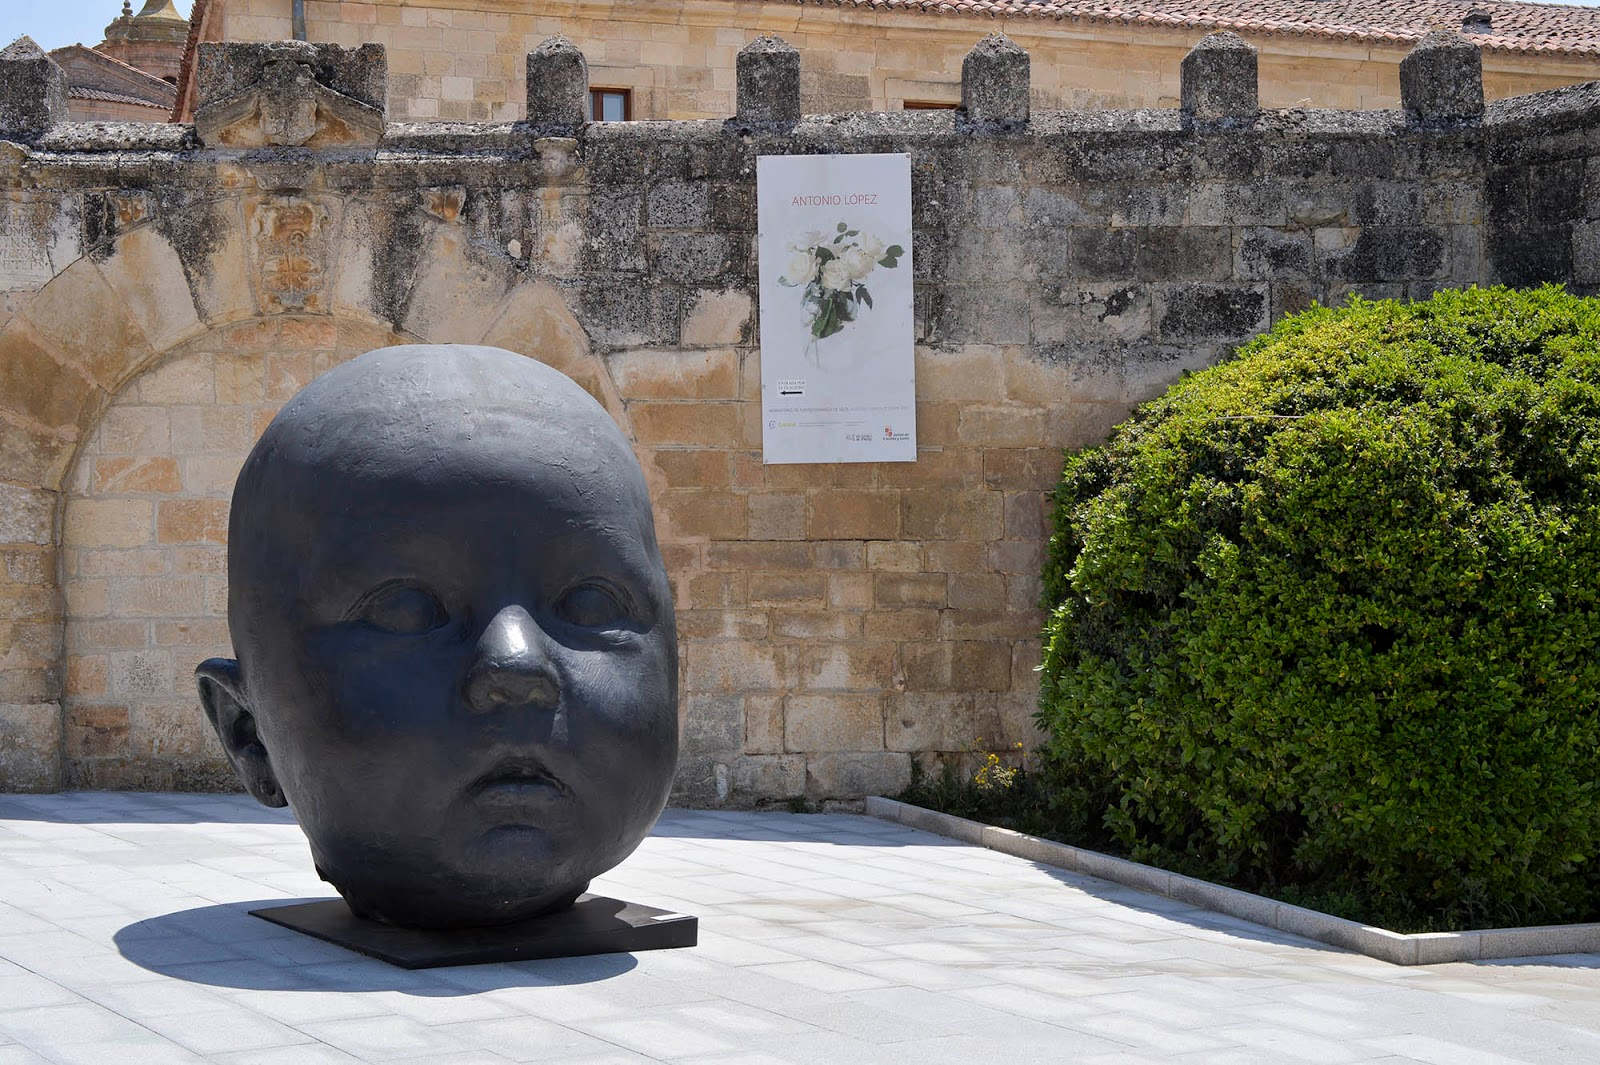 santo domingo silos antonio lopez escultura niño bebe burgos